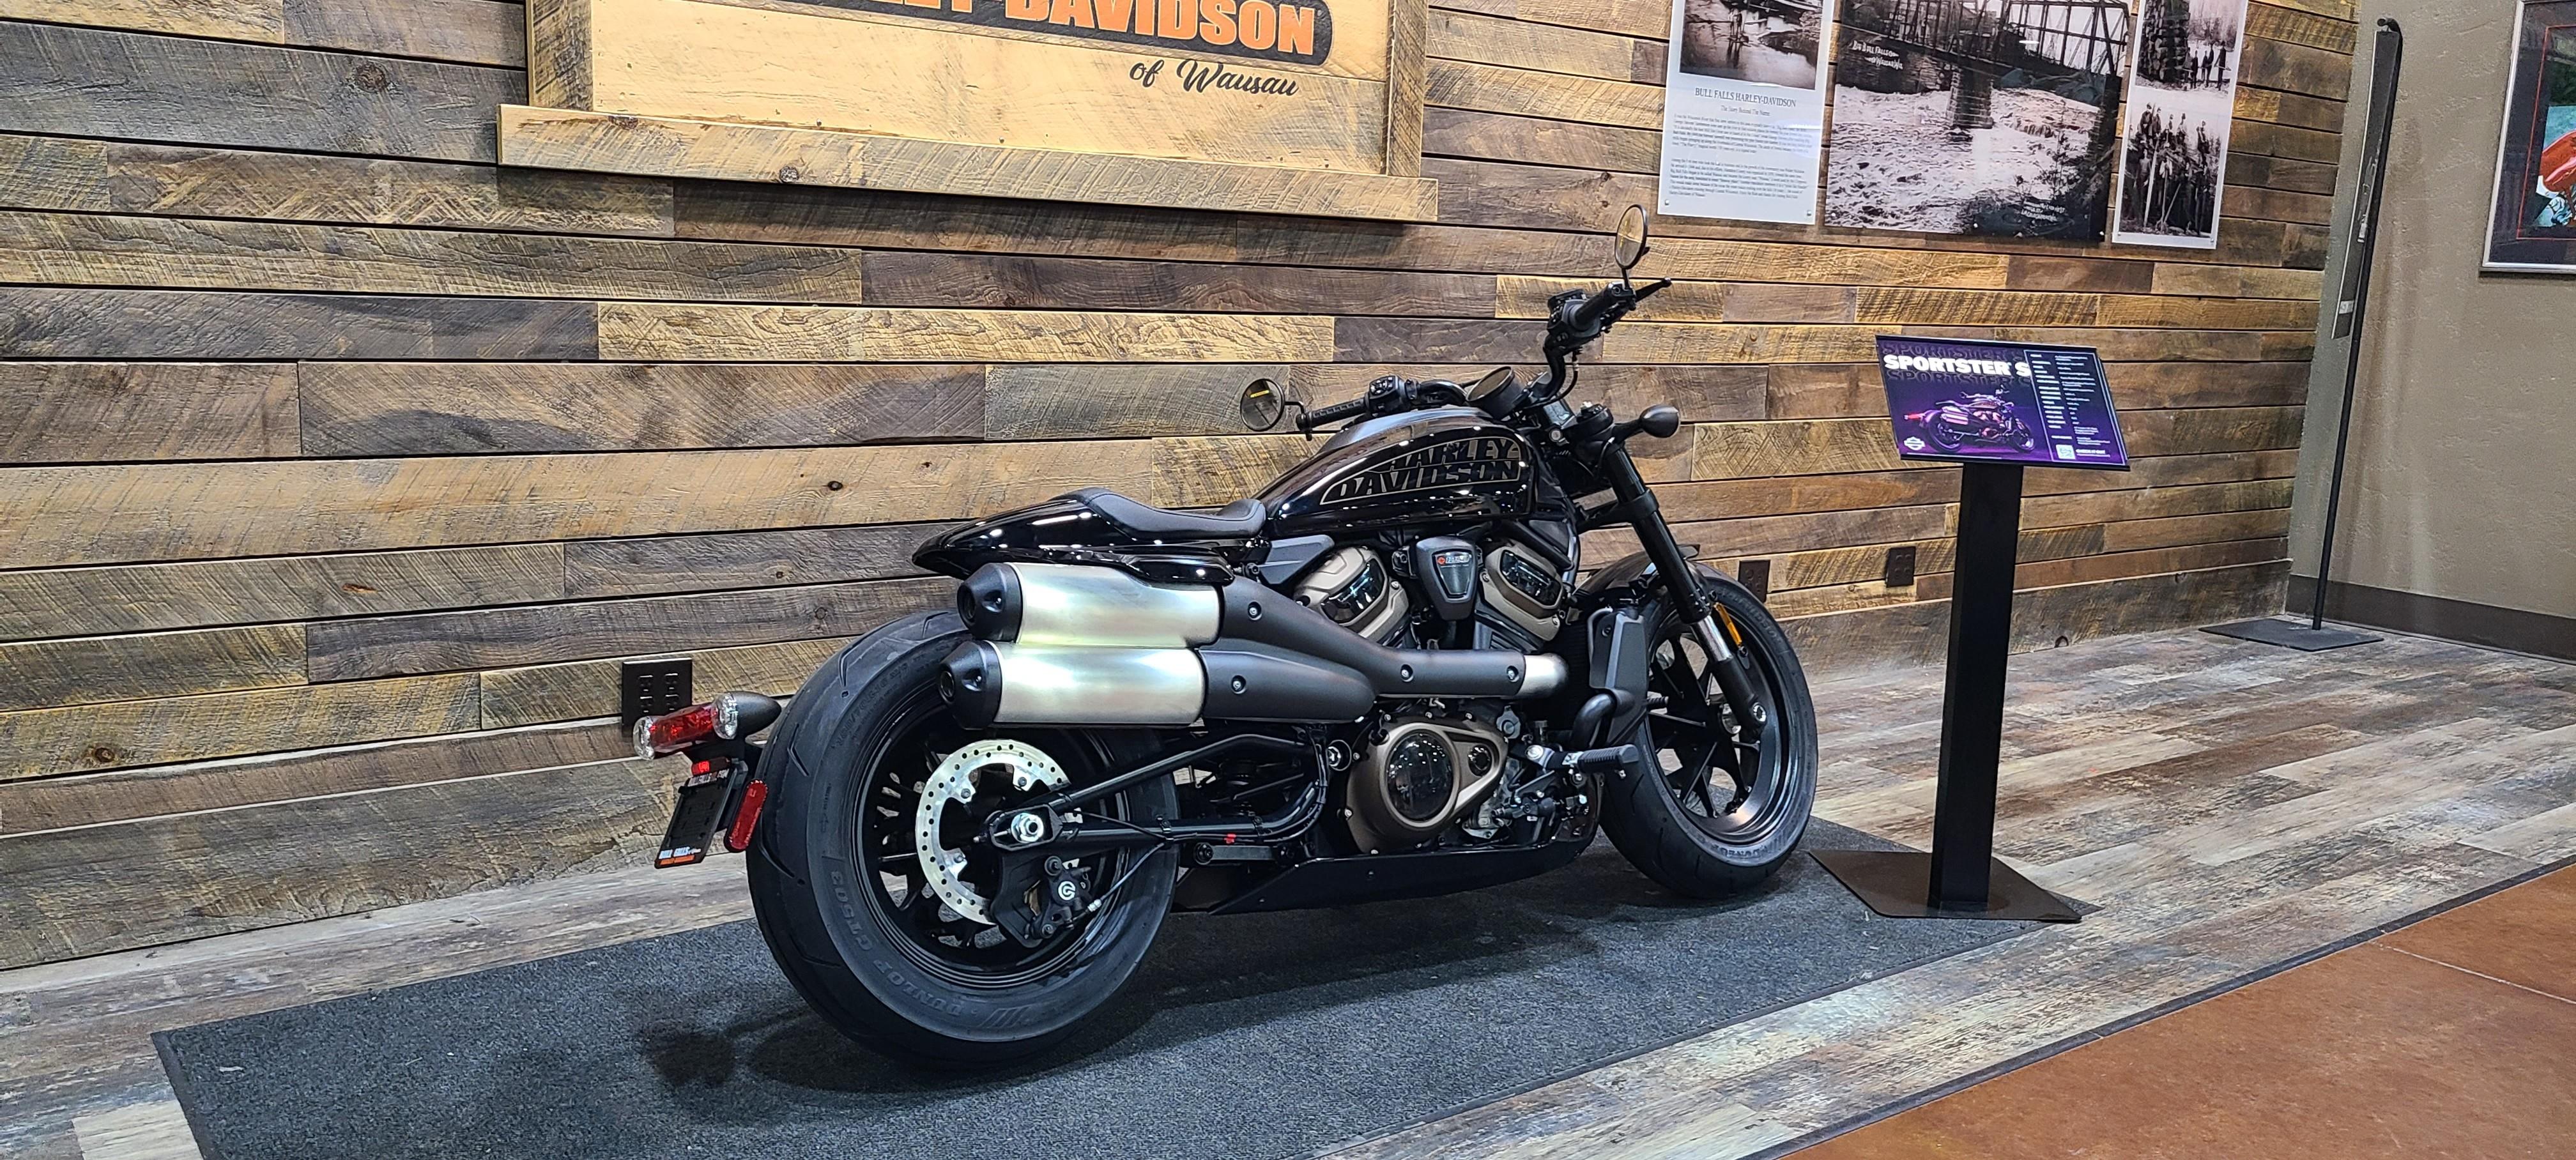 2021 Harley-Davidson Sportster S at Bull Falls Harley-Davidson